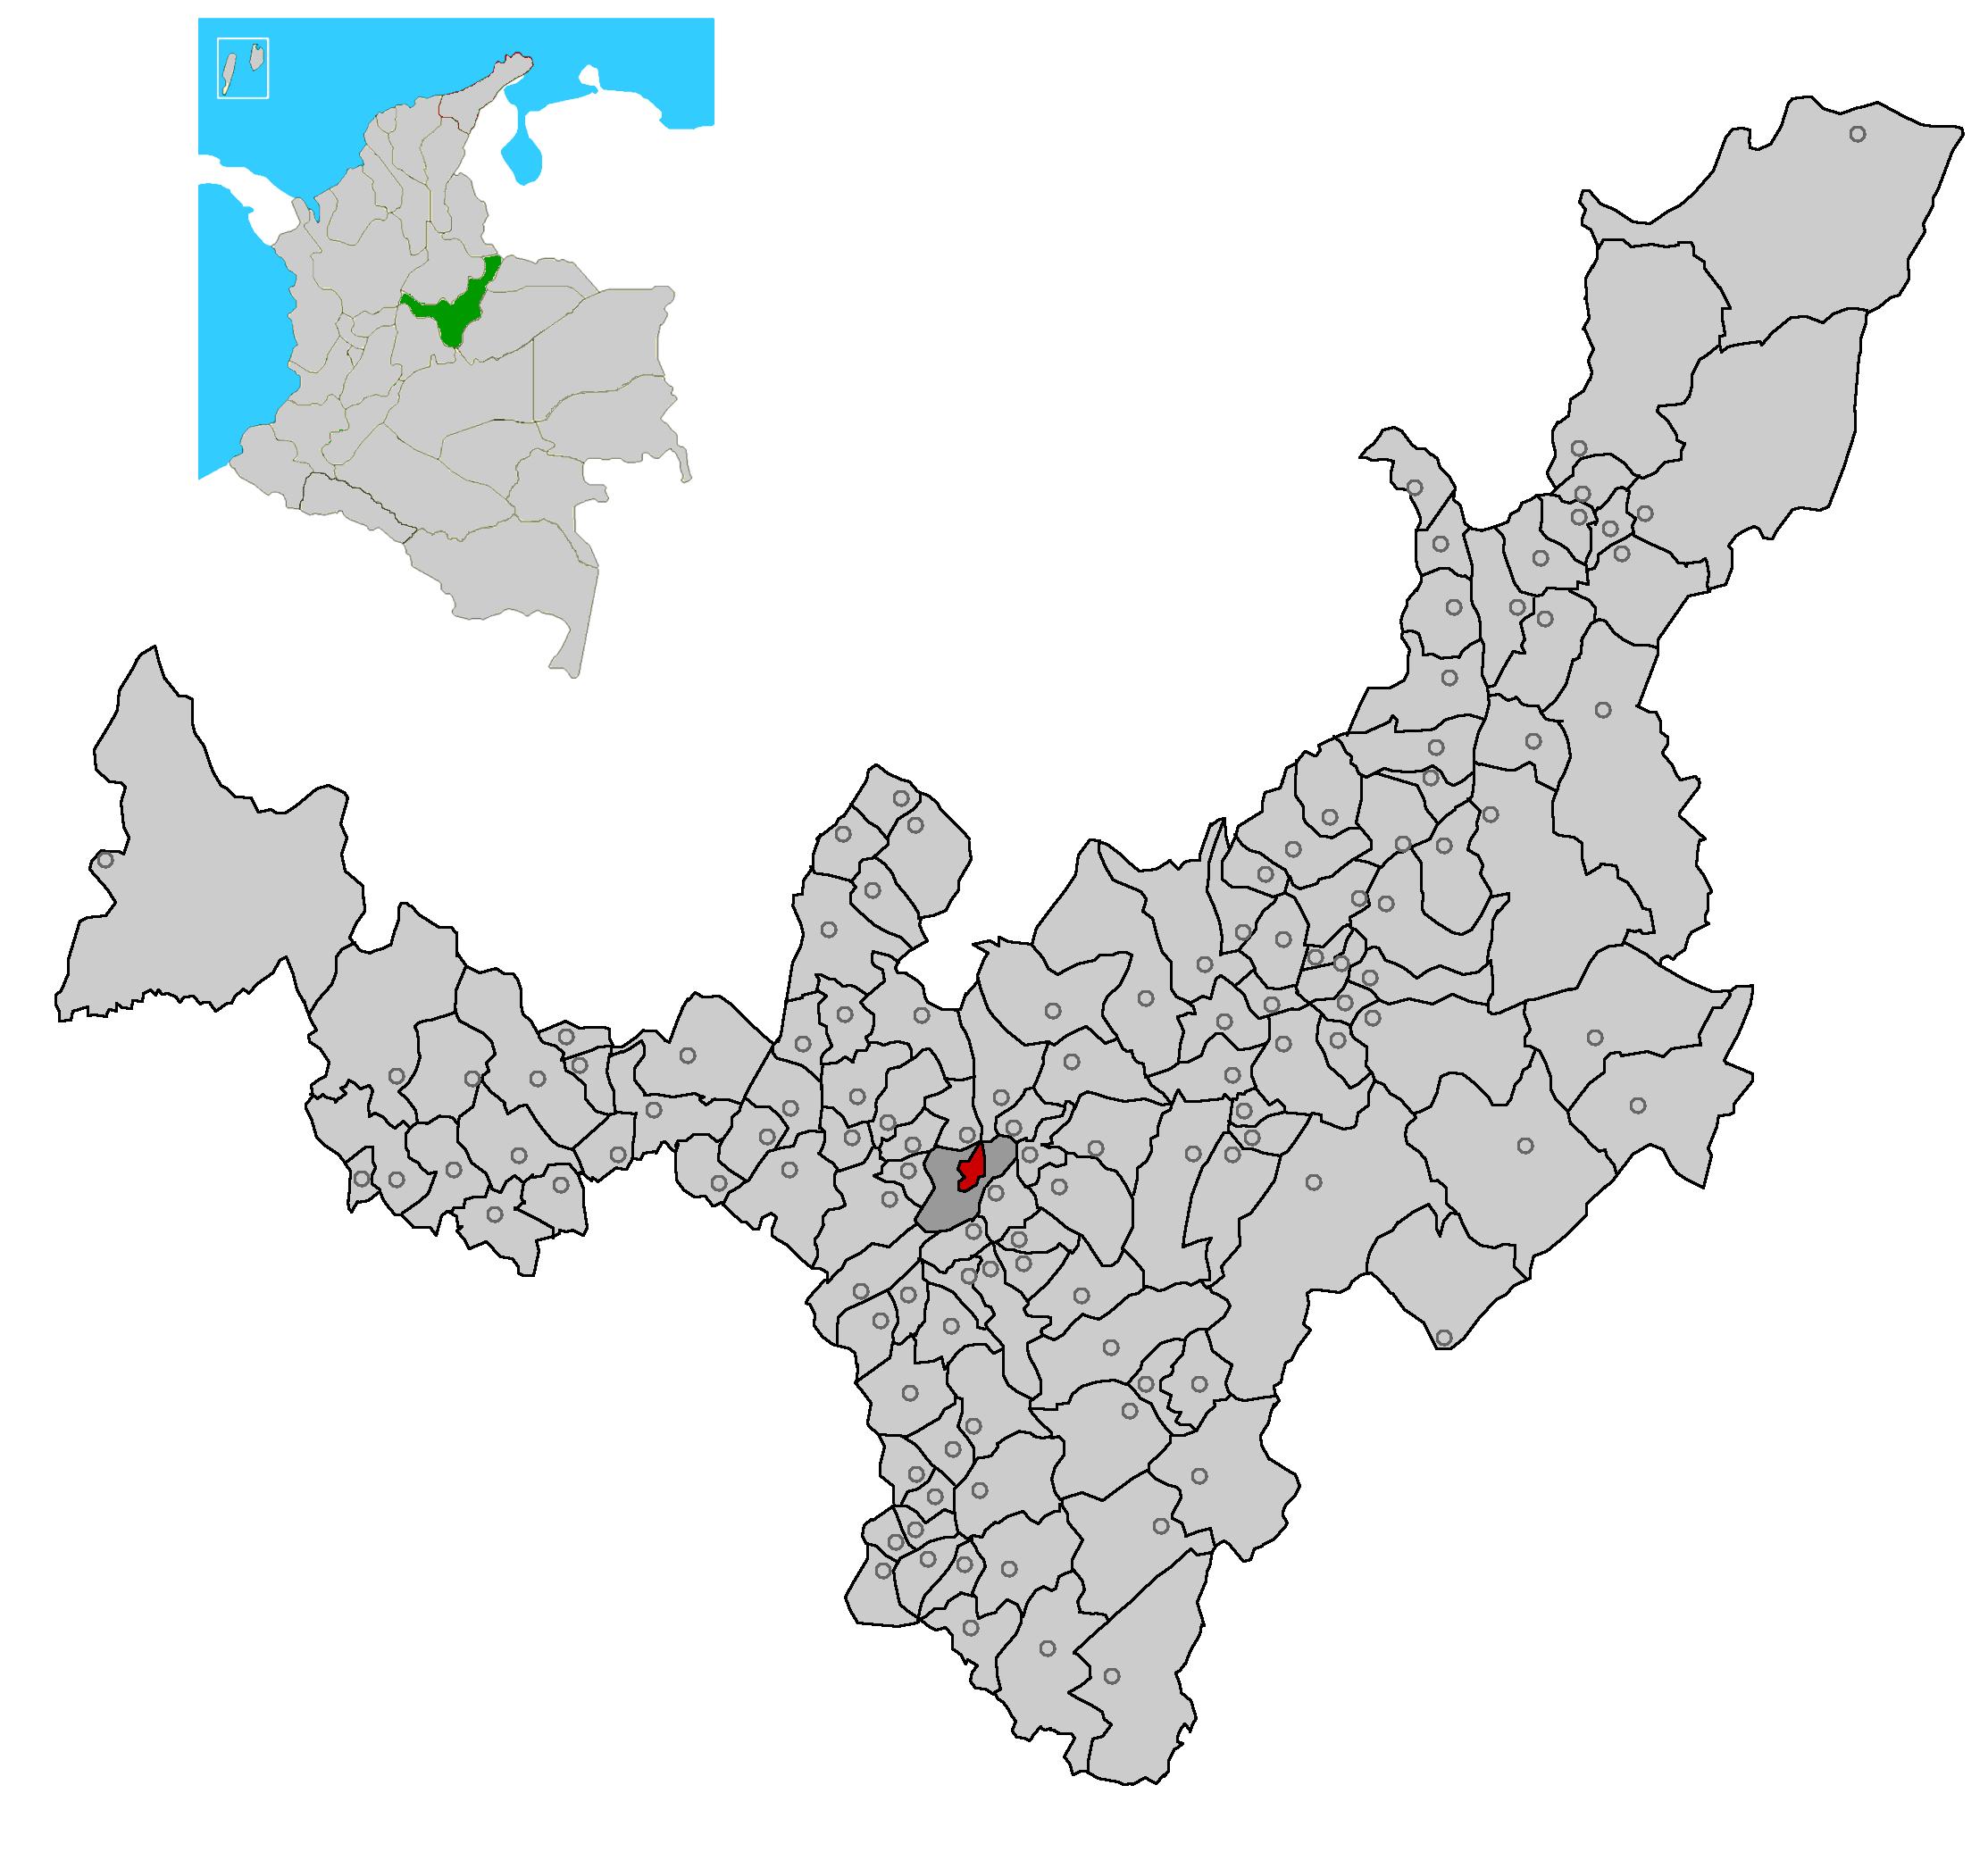 FileMunsBoyaca Tunjapng Wikimedia Commons - Tunja map